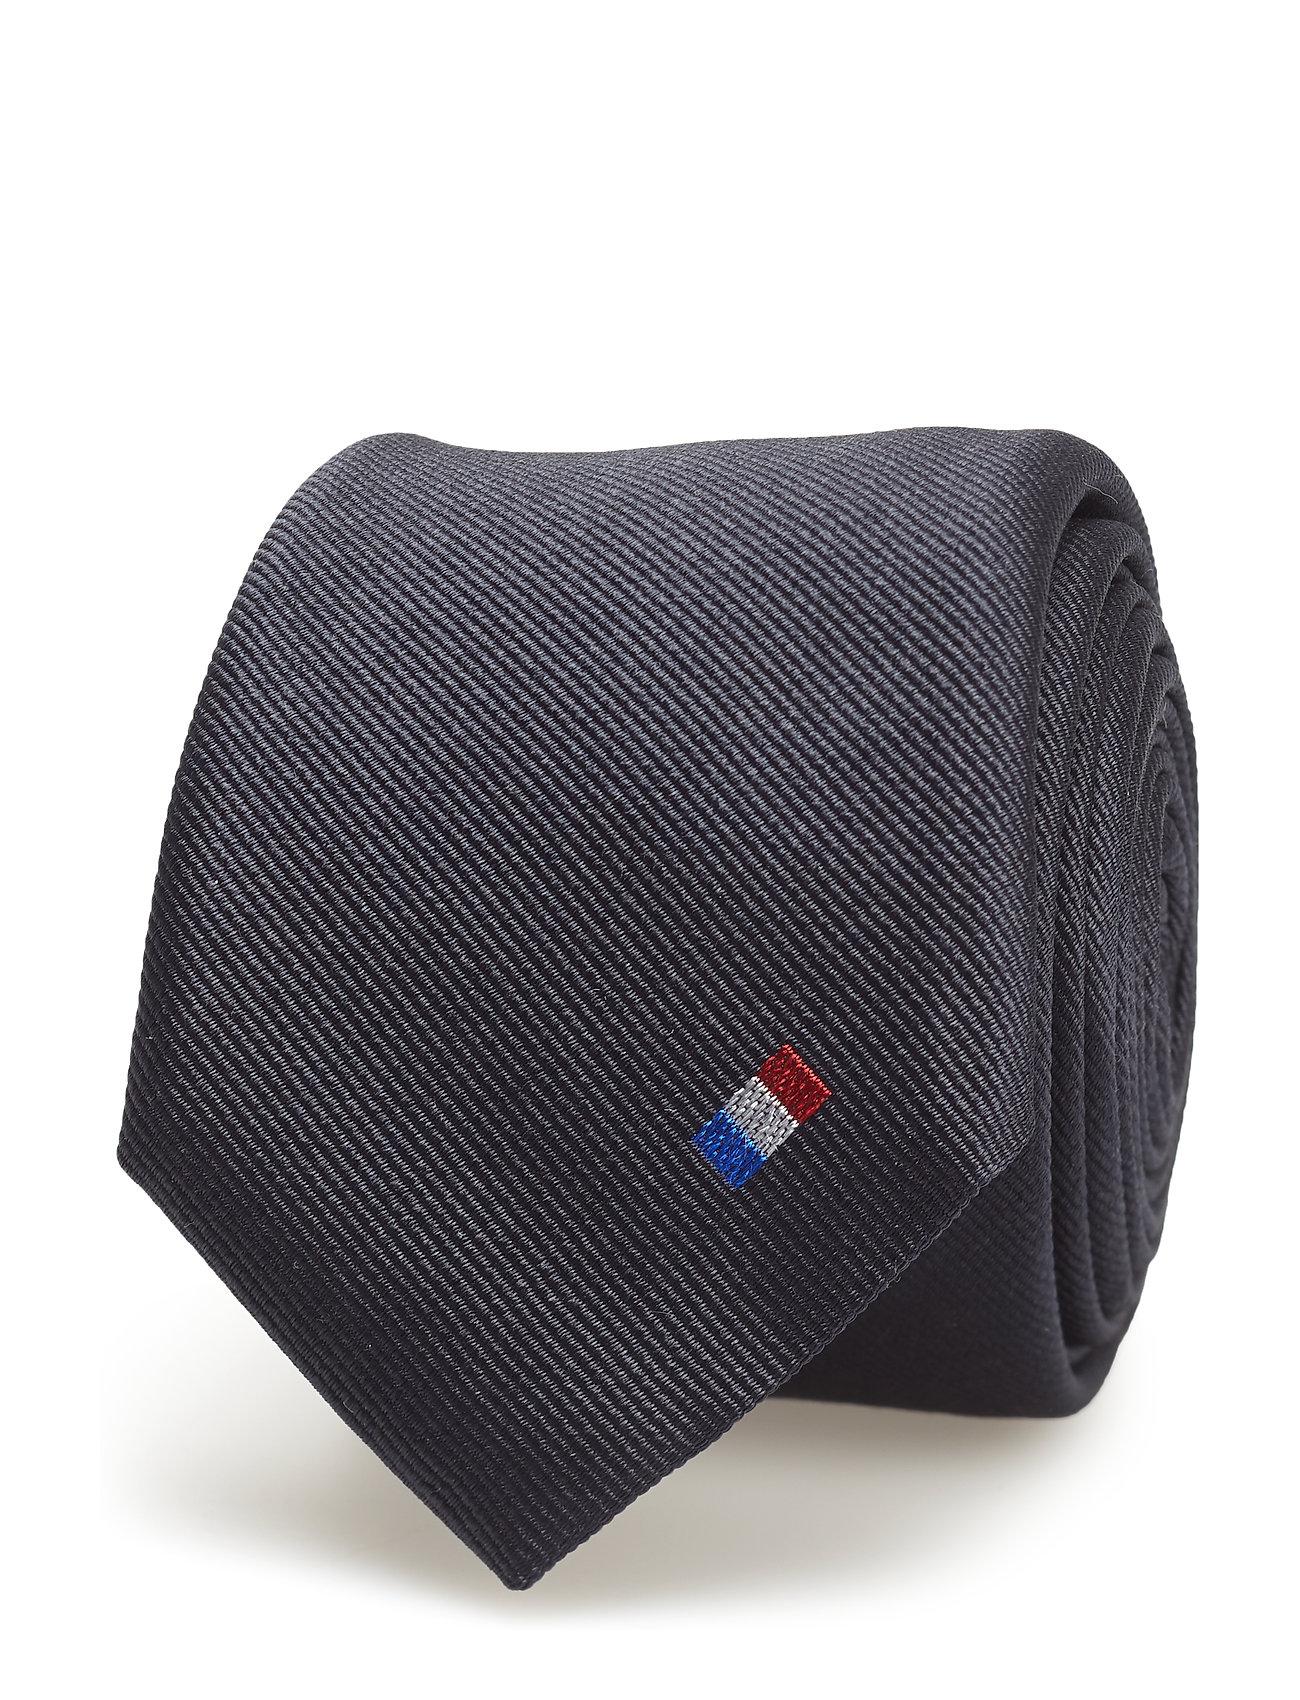 Image of Tie 6 Cm Slips Blå BOSS Business Wear (3333155123)